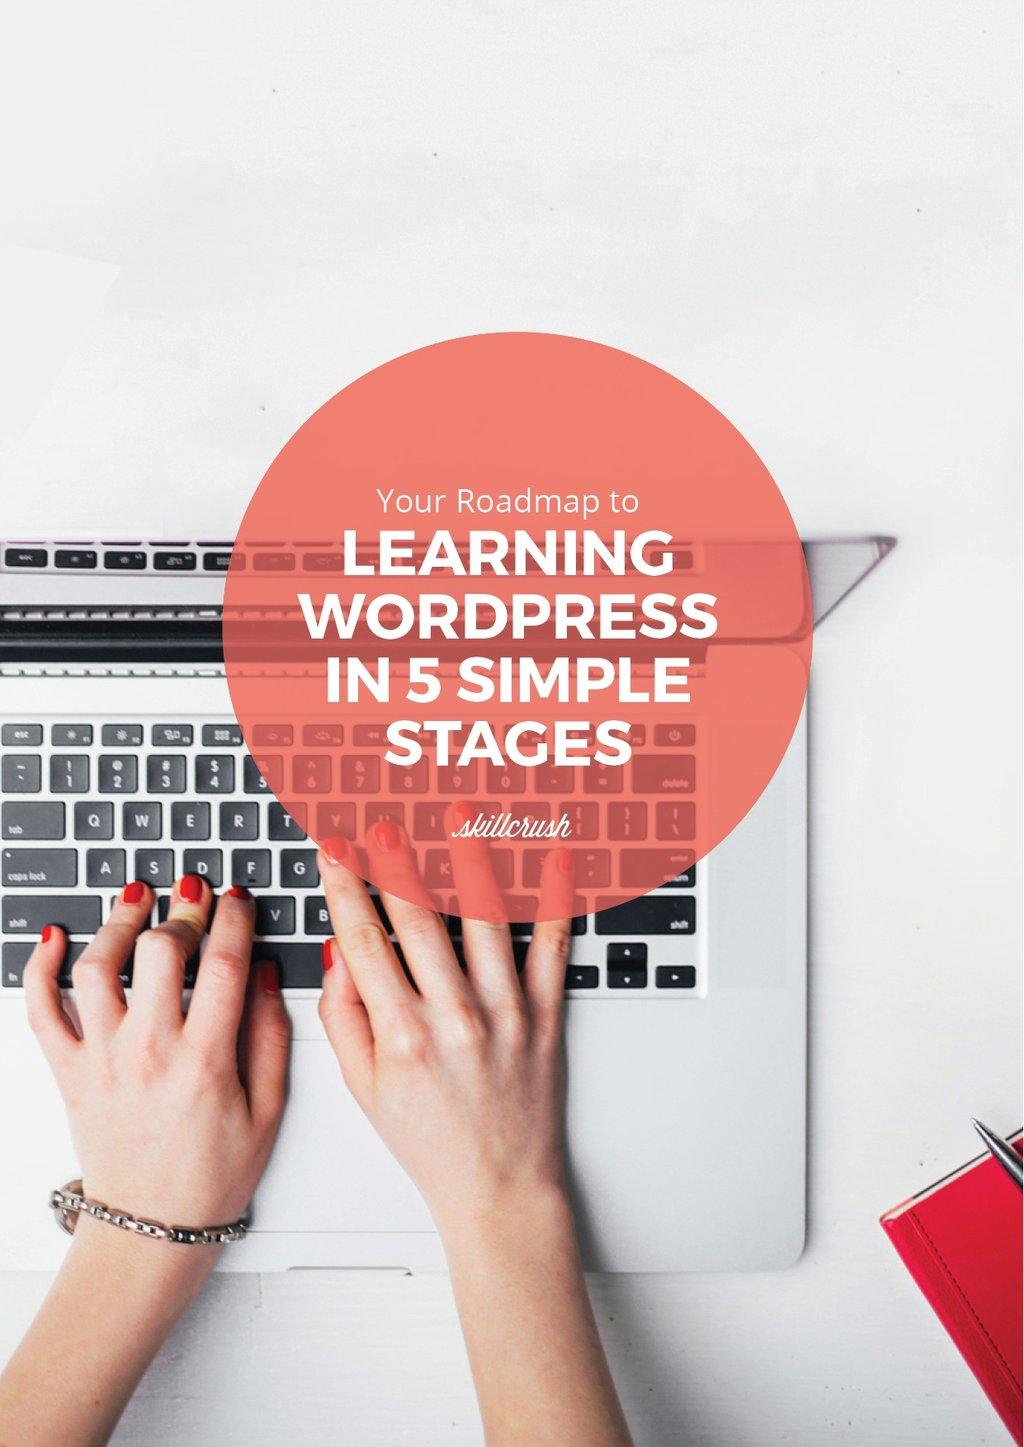 your_roadmap_to_learn_wordpress.jpg